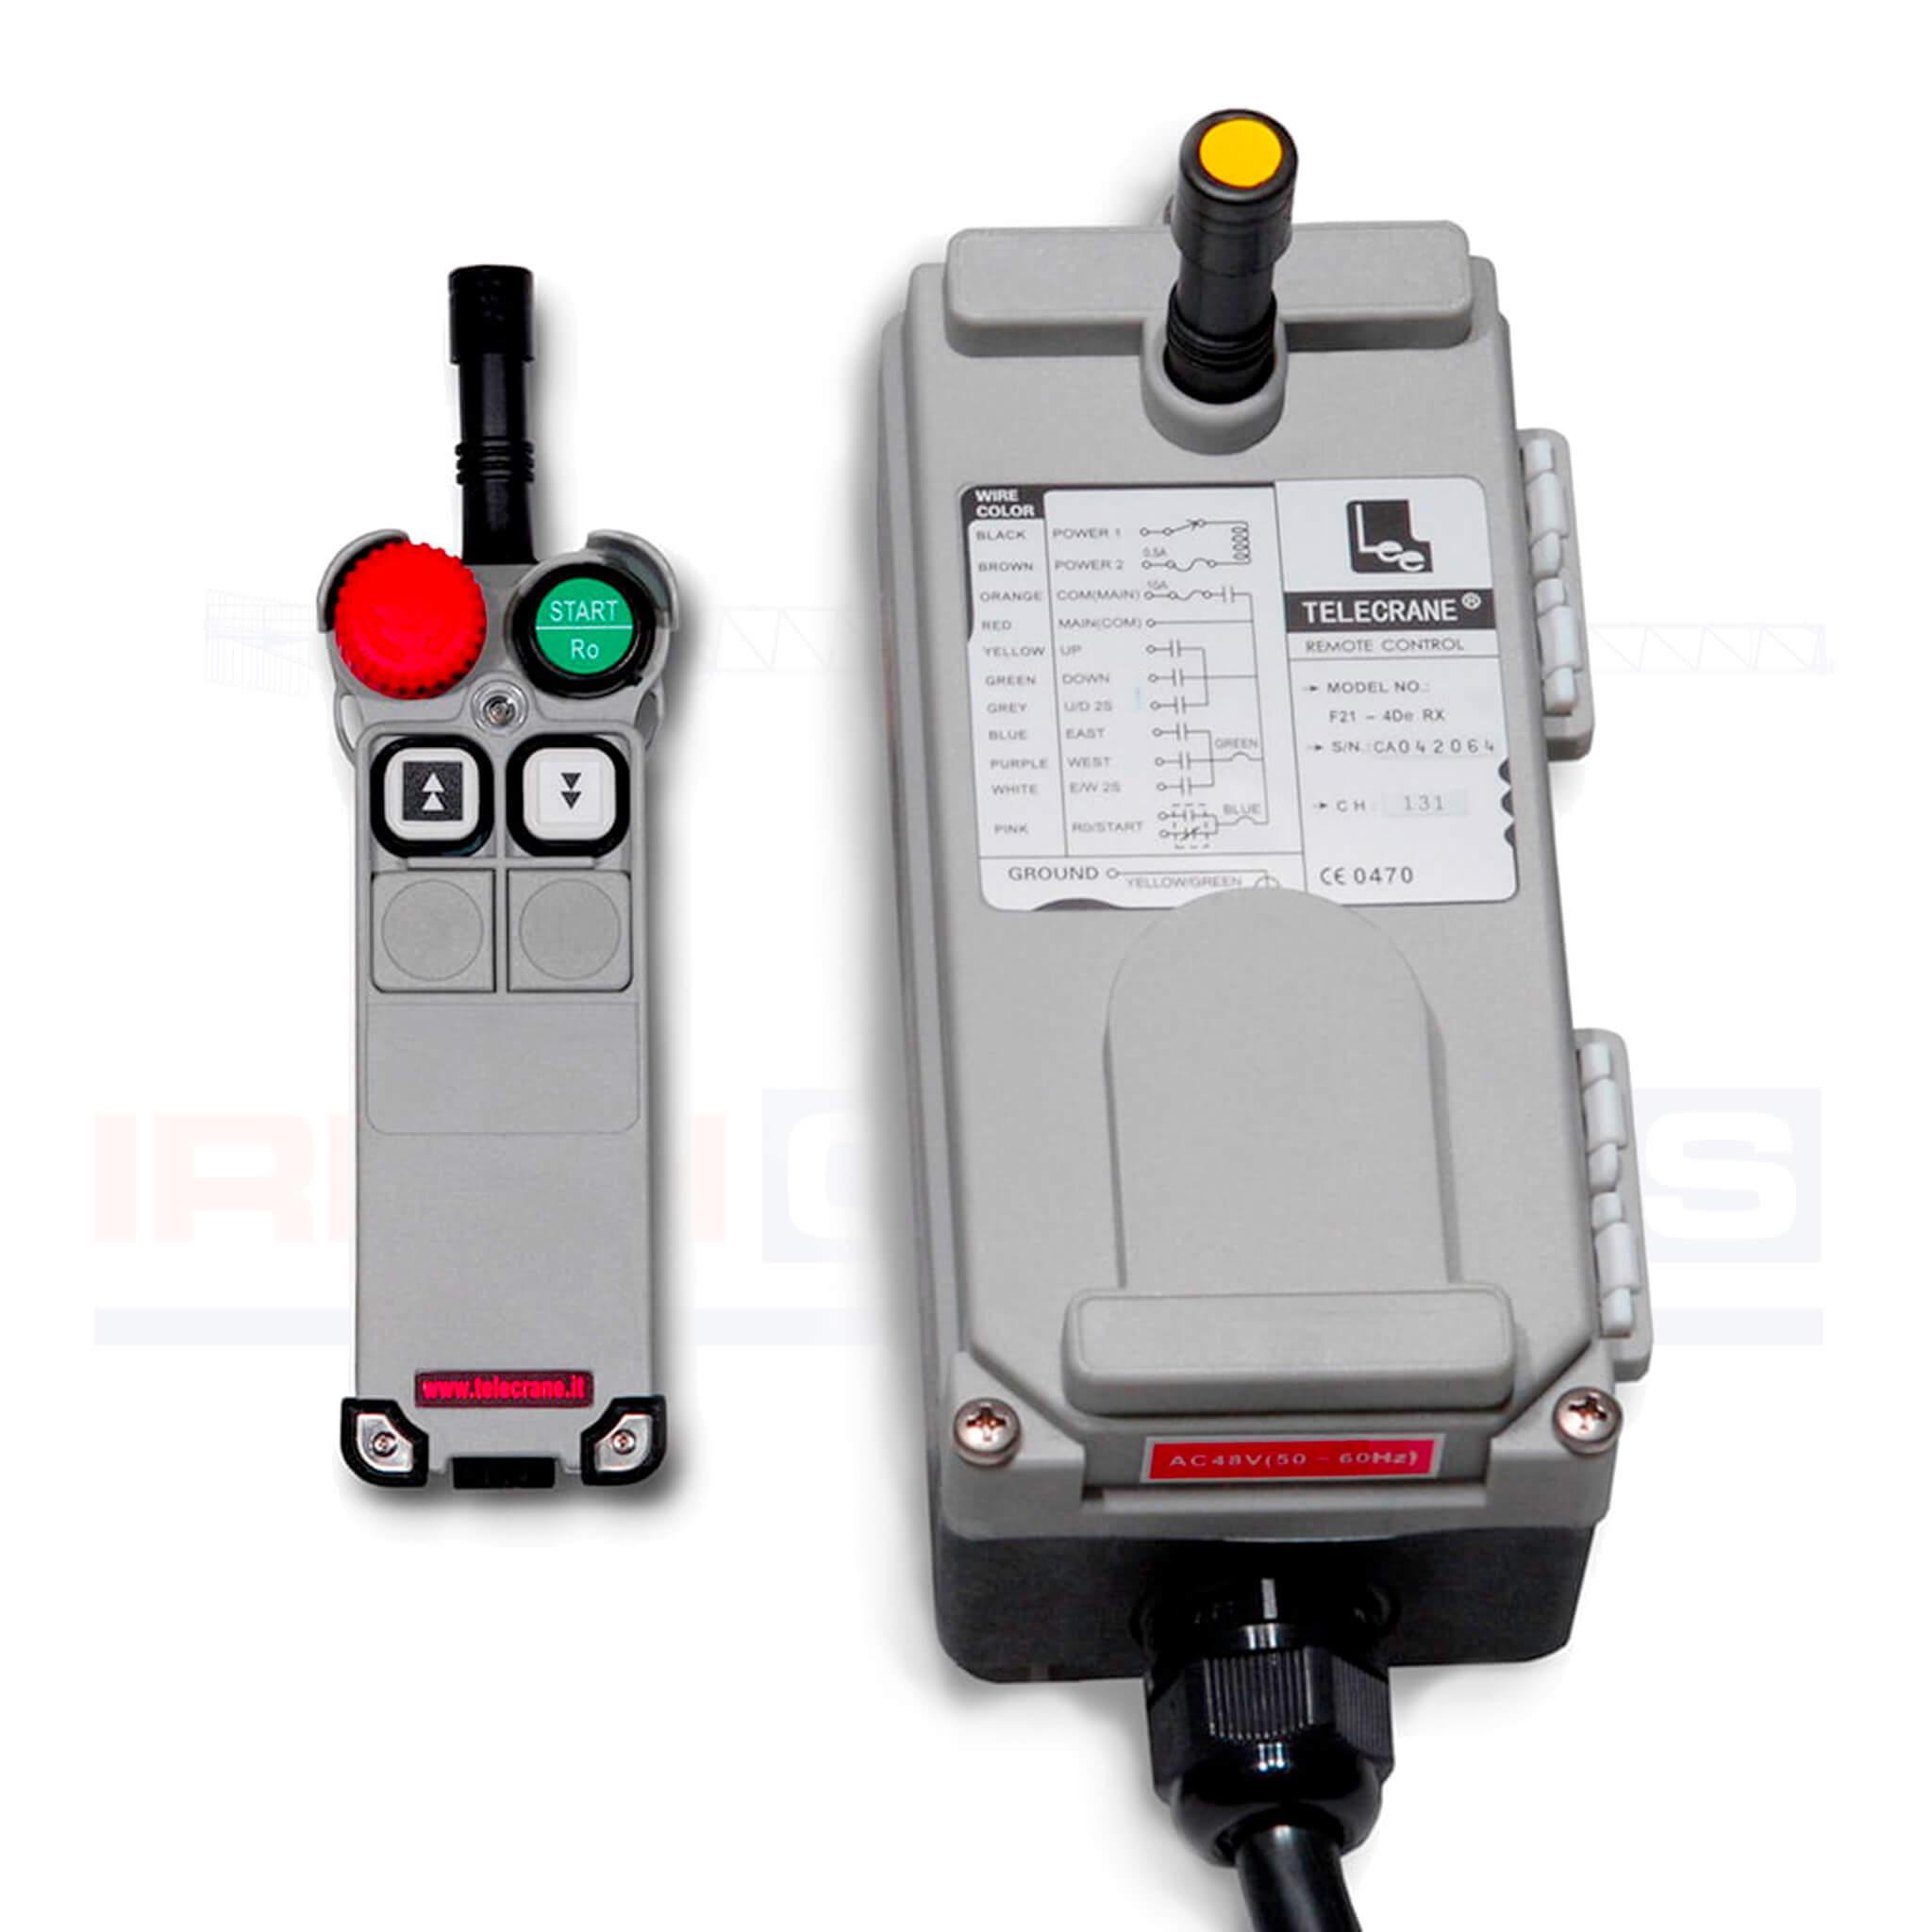 Silver Hoist F21 4D 2 remote control